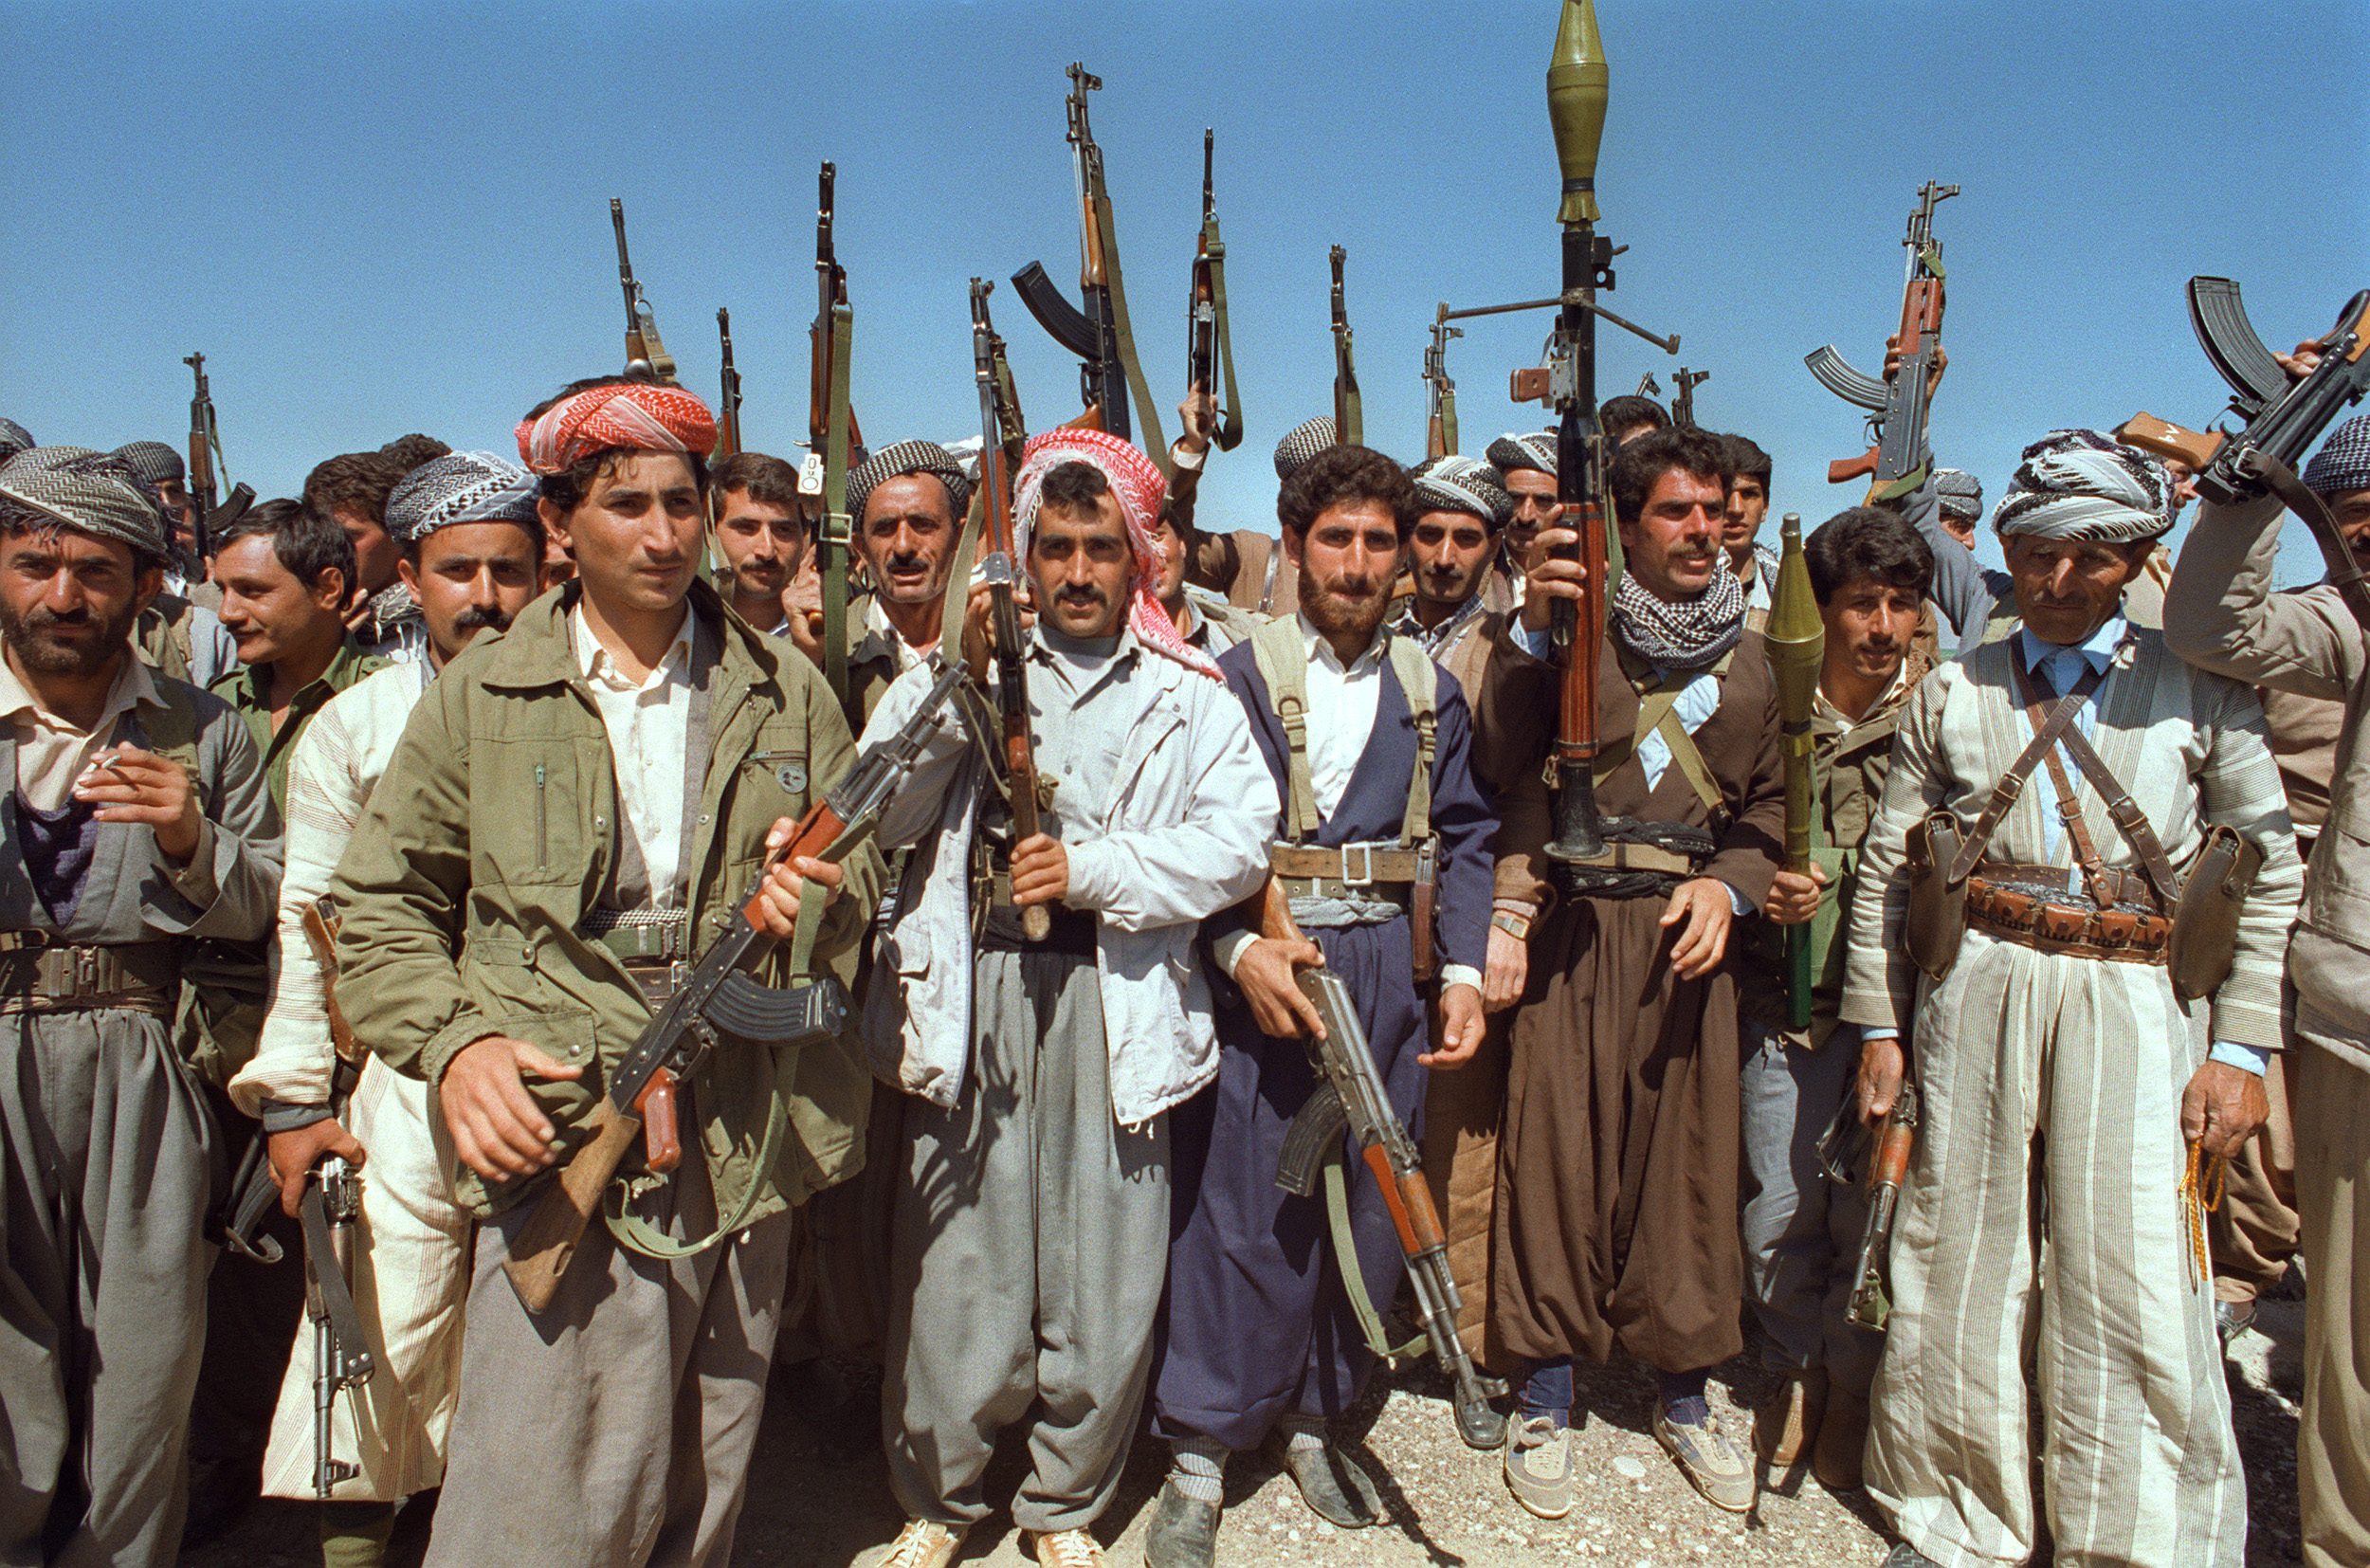 The Heroic Kurds: America's Mistreated Ally